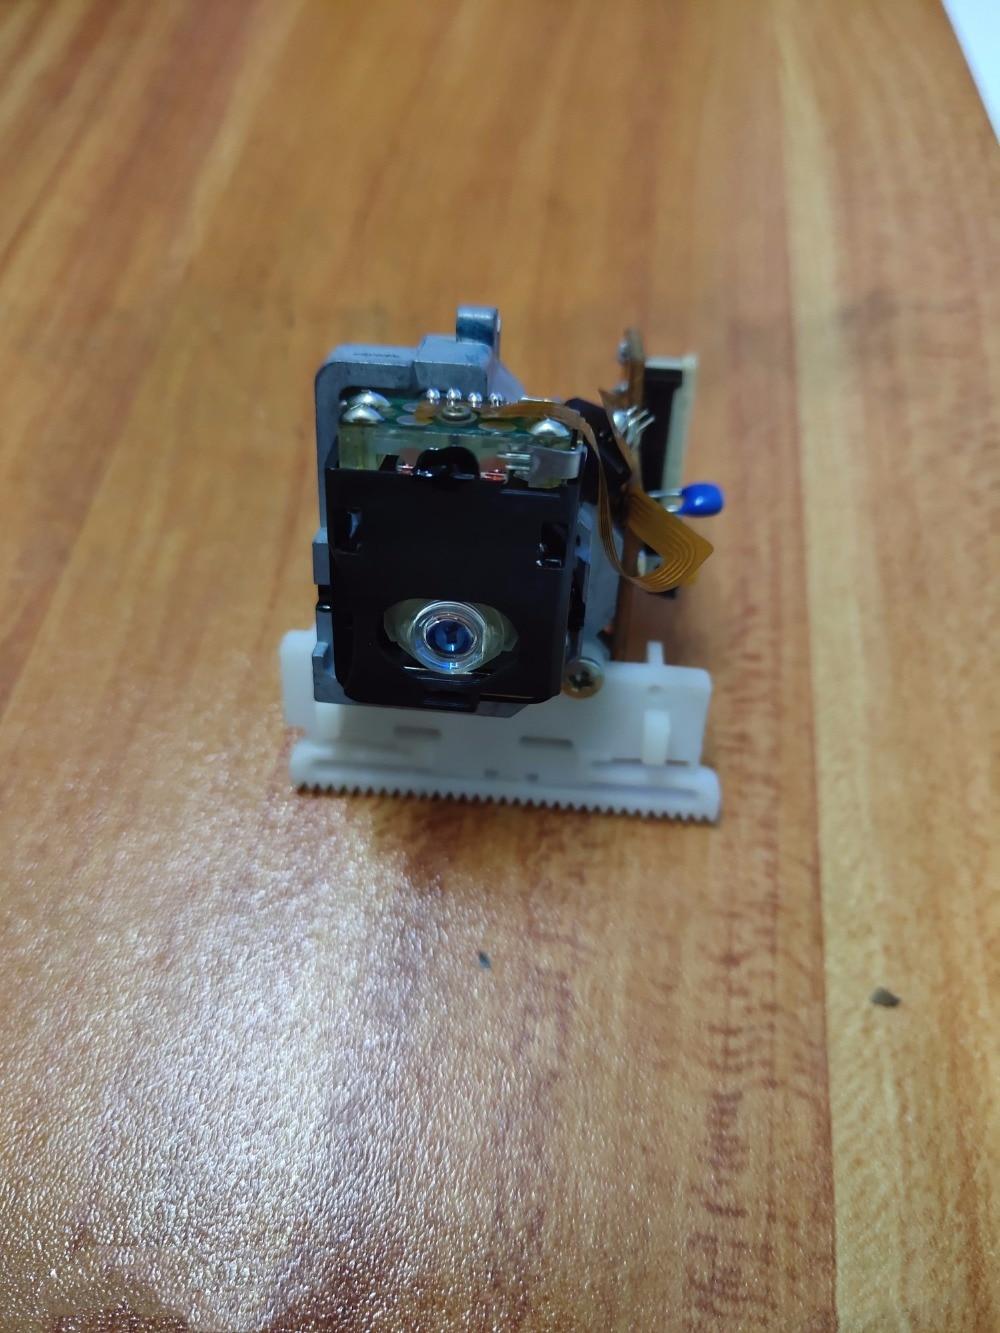 Replacement For JVC UX-A50 CD Player Spare Parts Laser Lens Lasereinheit ASSY Unit UXA50 Optical Pickup Bloc Optique